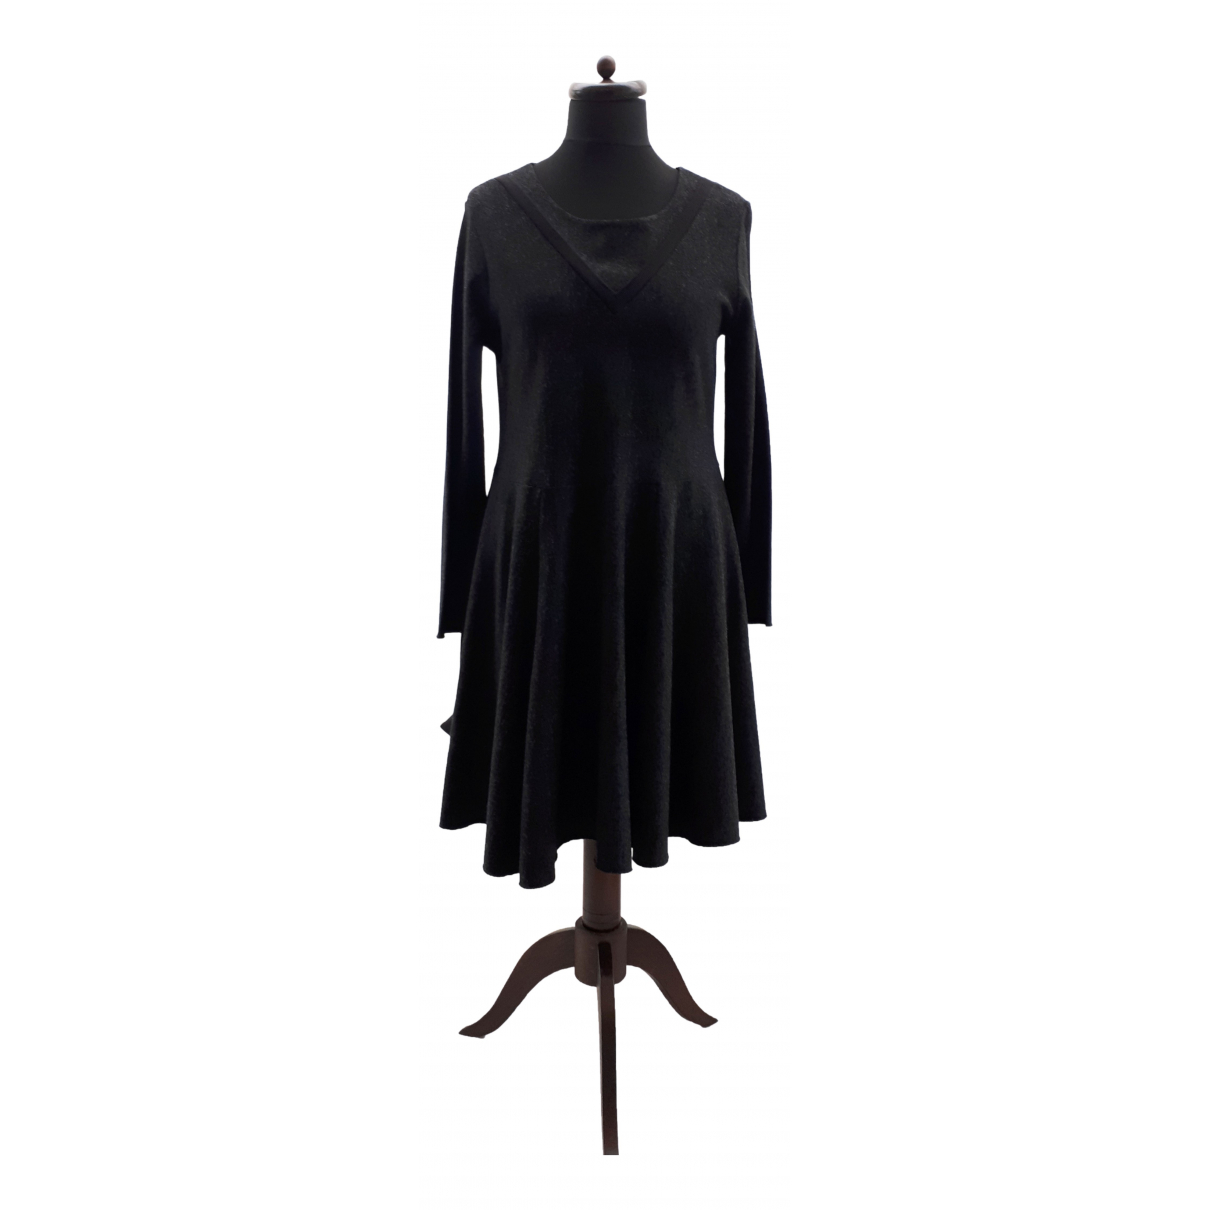 Cos \N Grey Cotton dress for Women L International